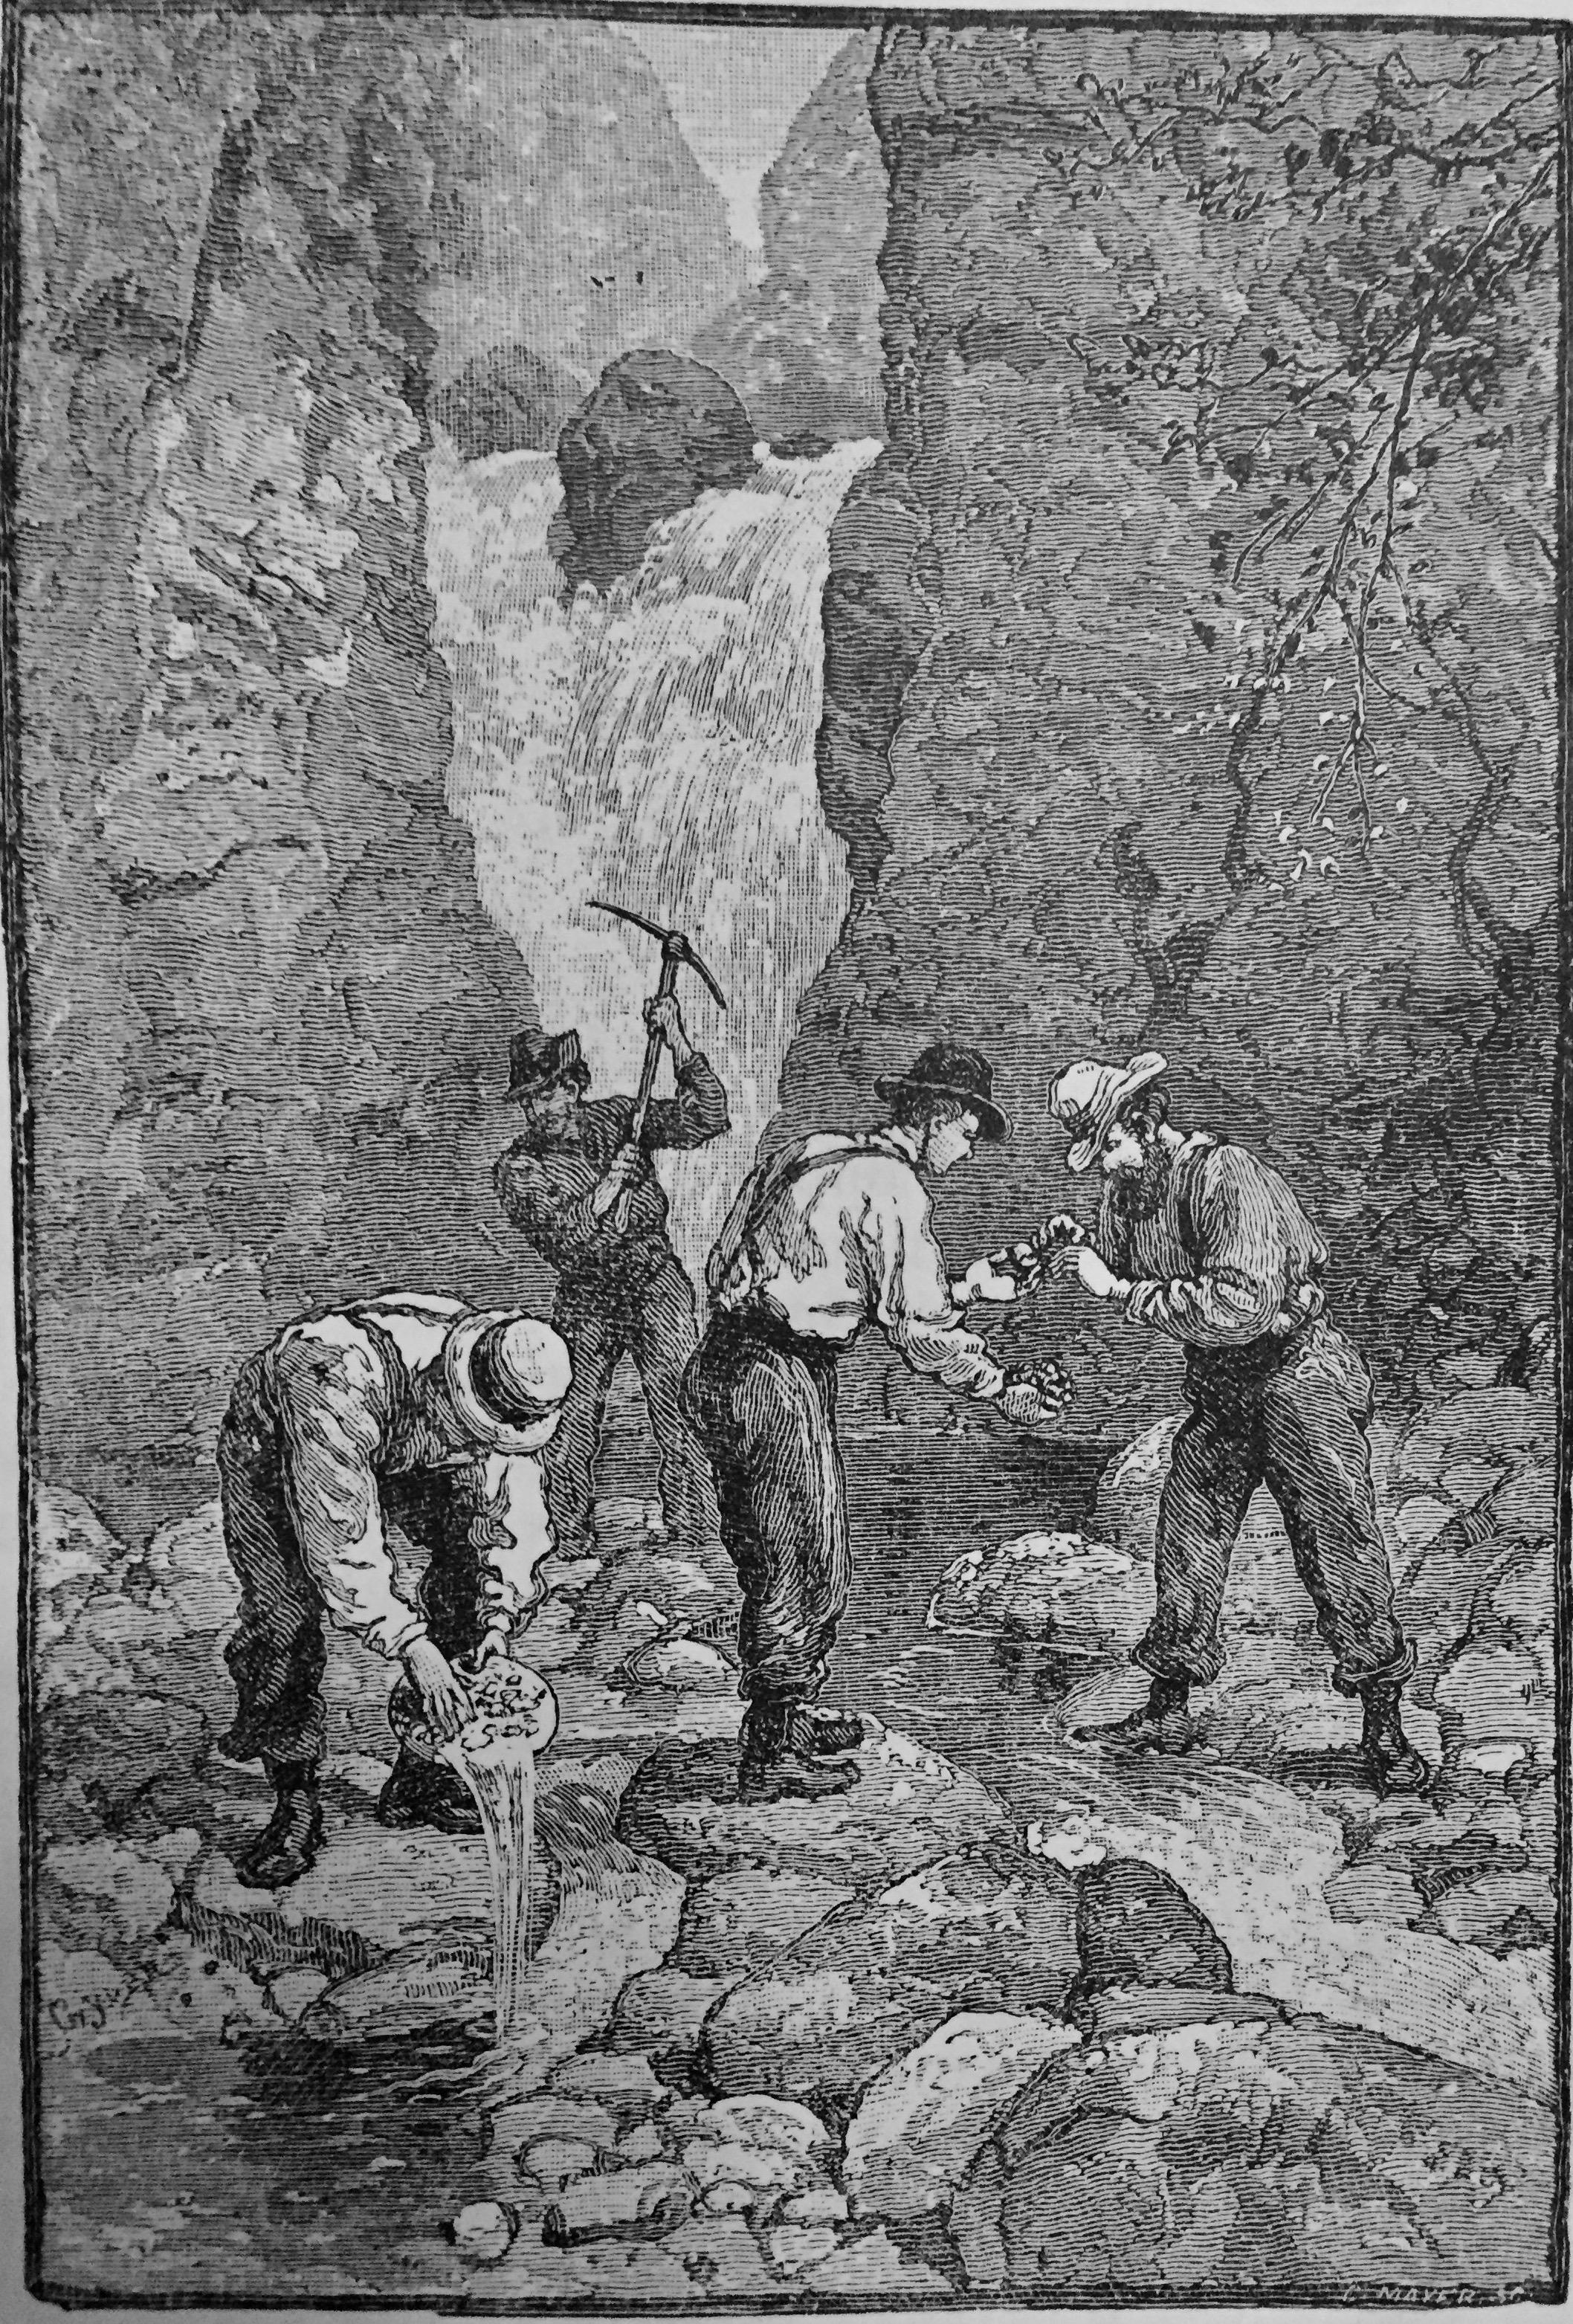 Goldmining in Dahlonega, Georgia in 1879.